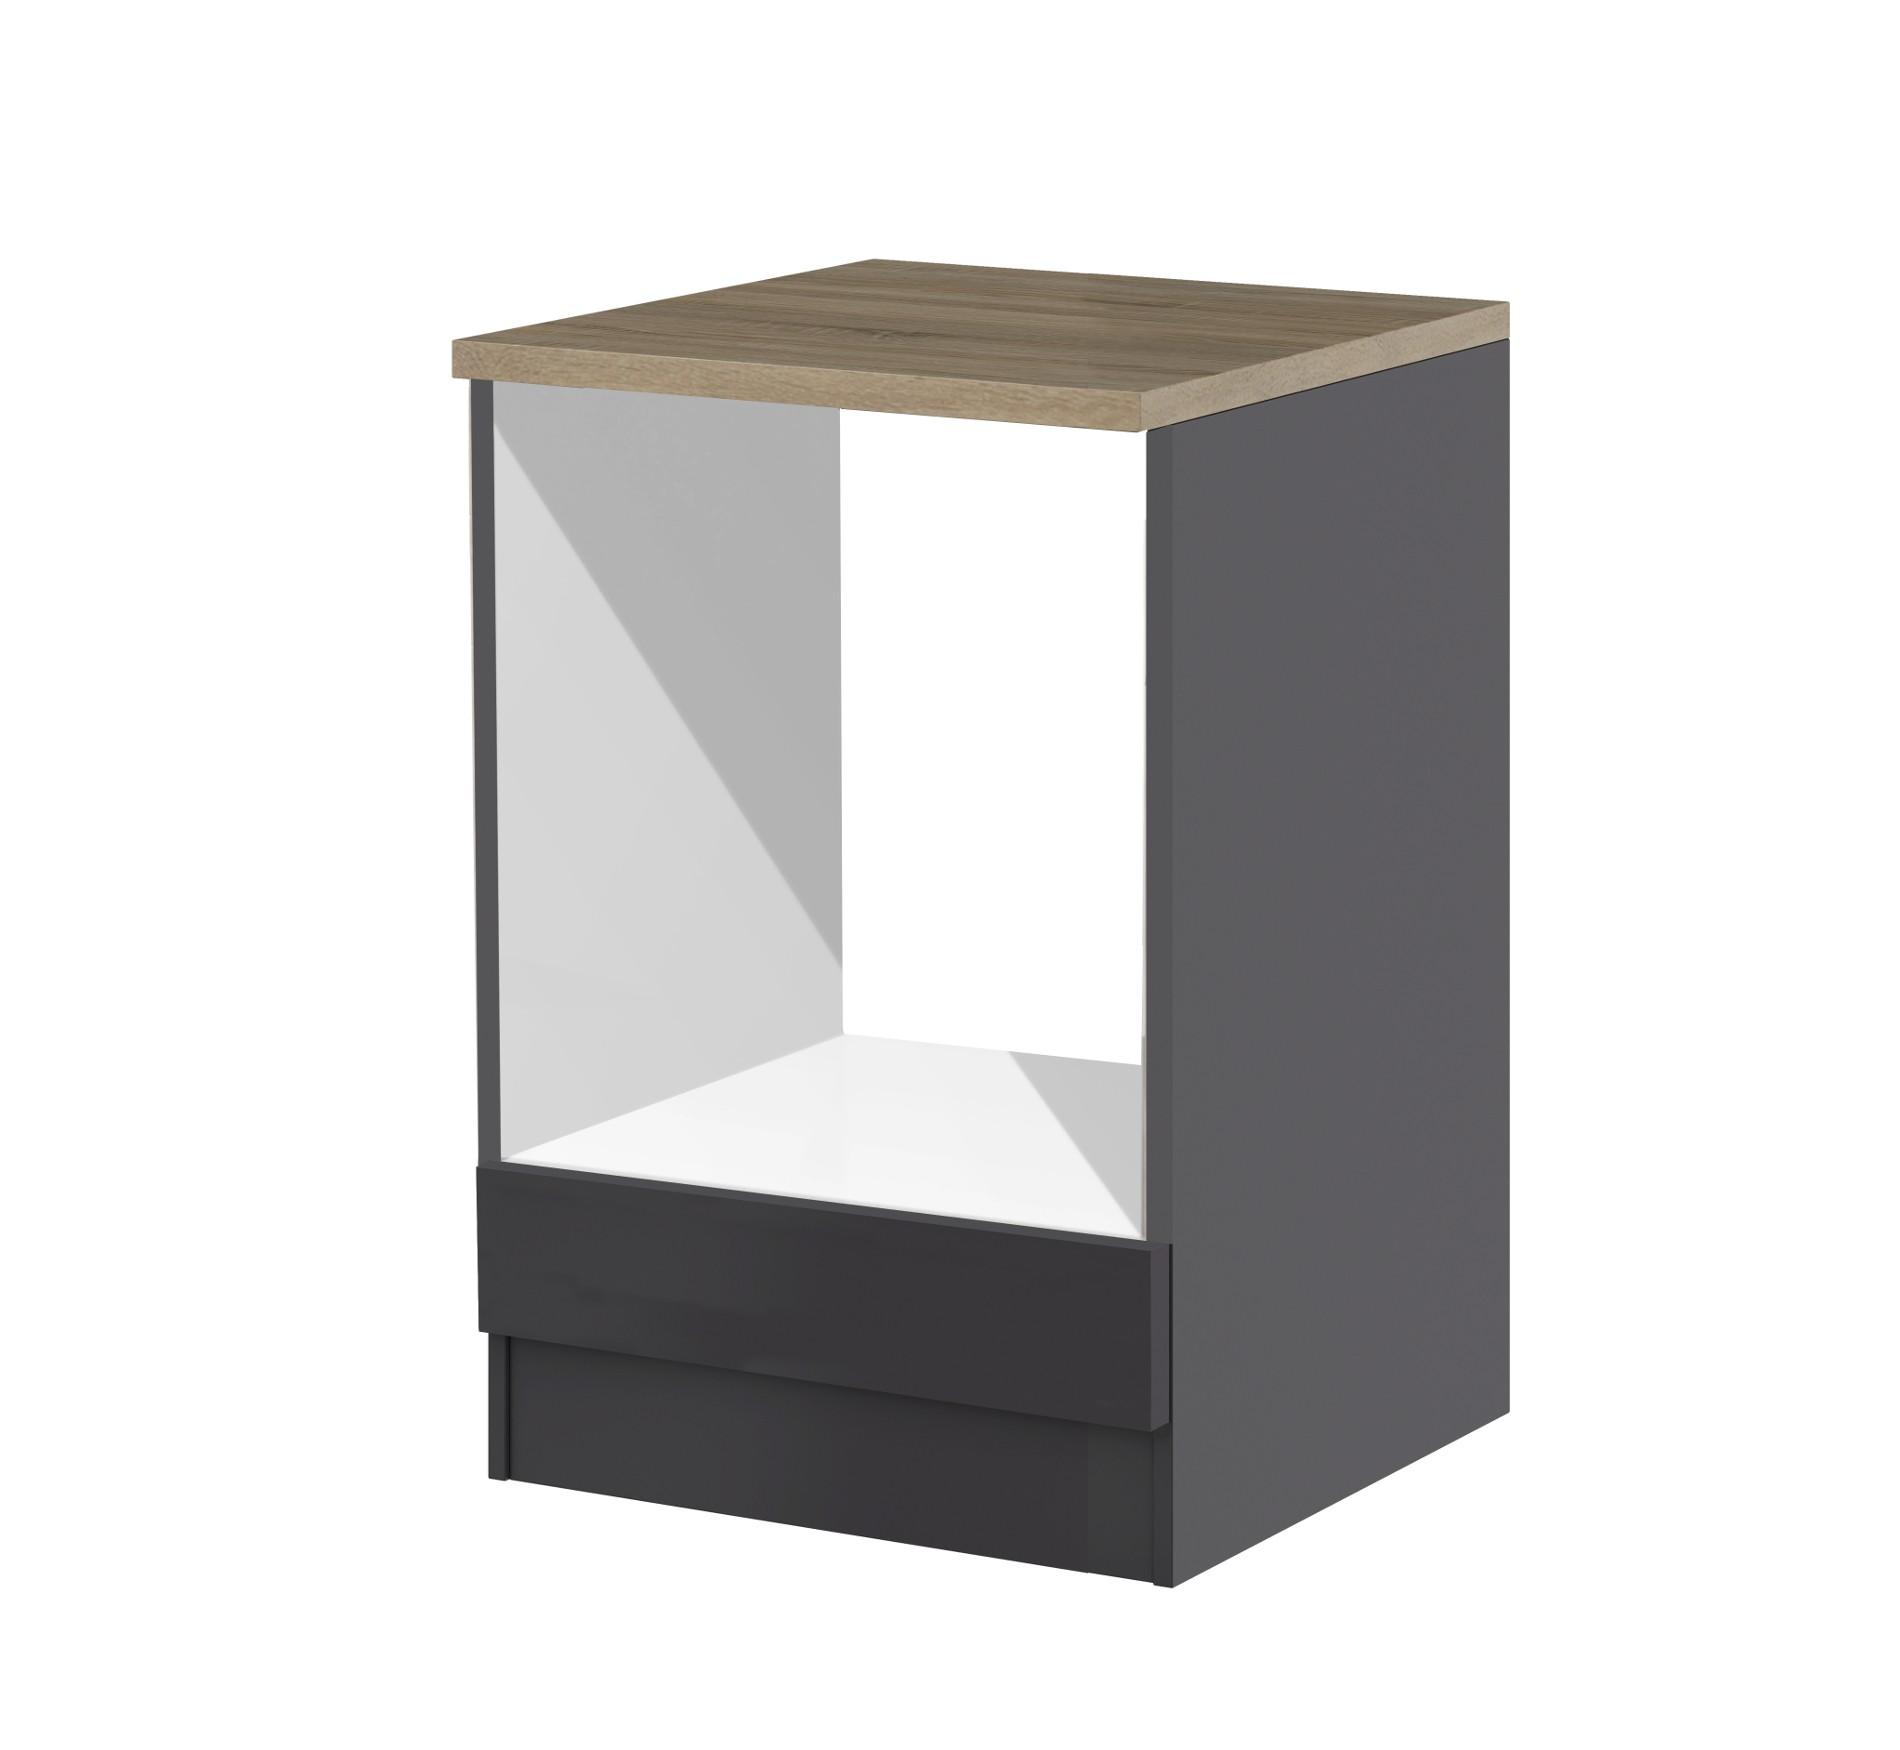 herdumbauschrank m nchen herdumbau k chenschrank 60 cm grau graphit. Black Bedroom Furniture Sets. Home Design Ideas